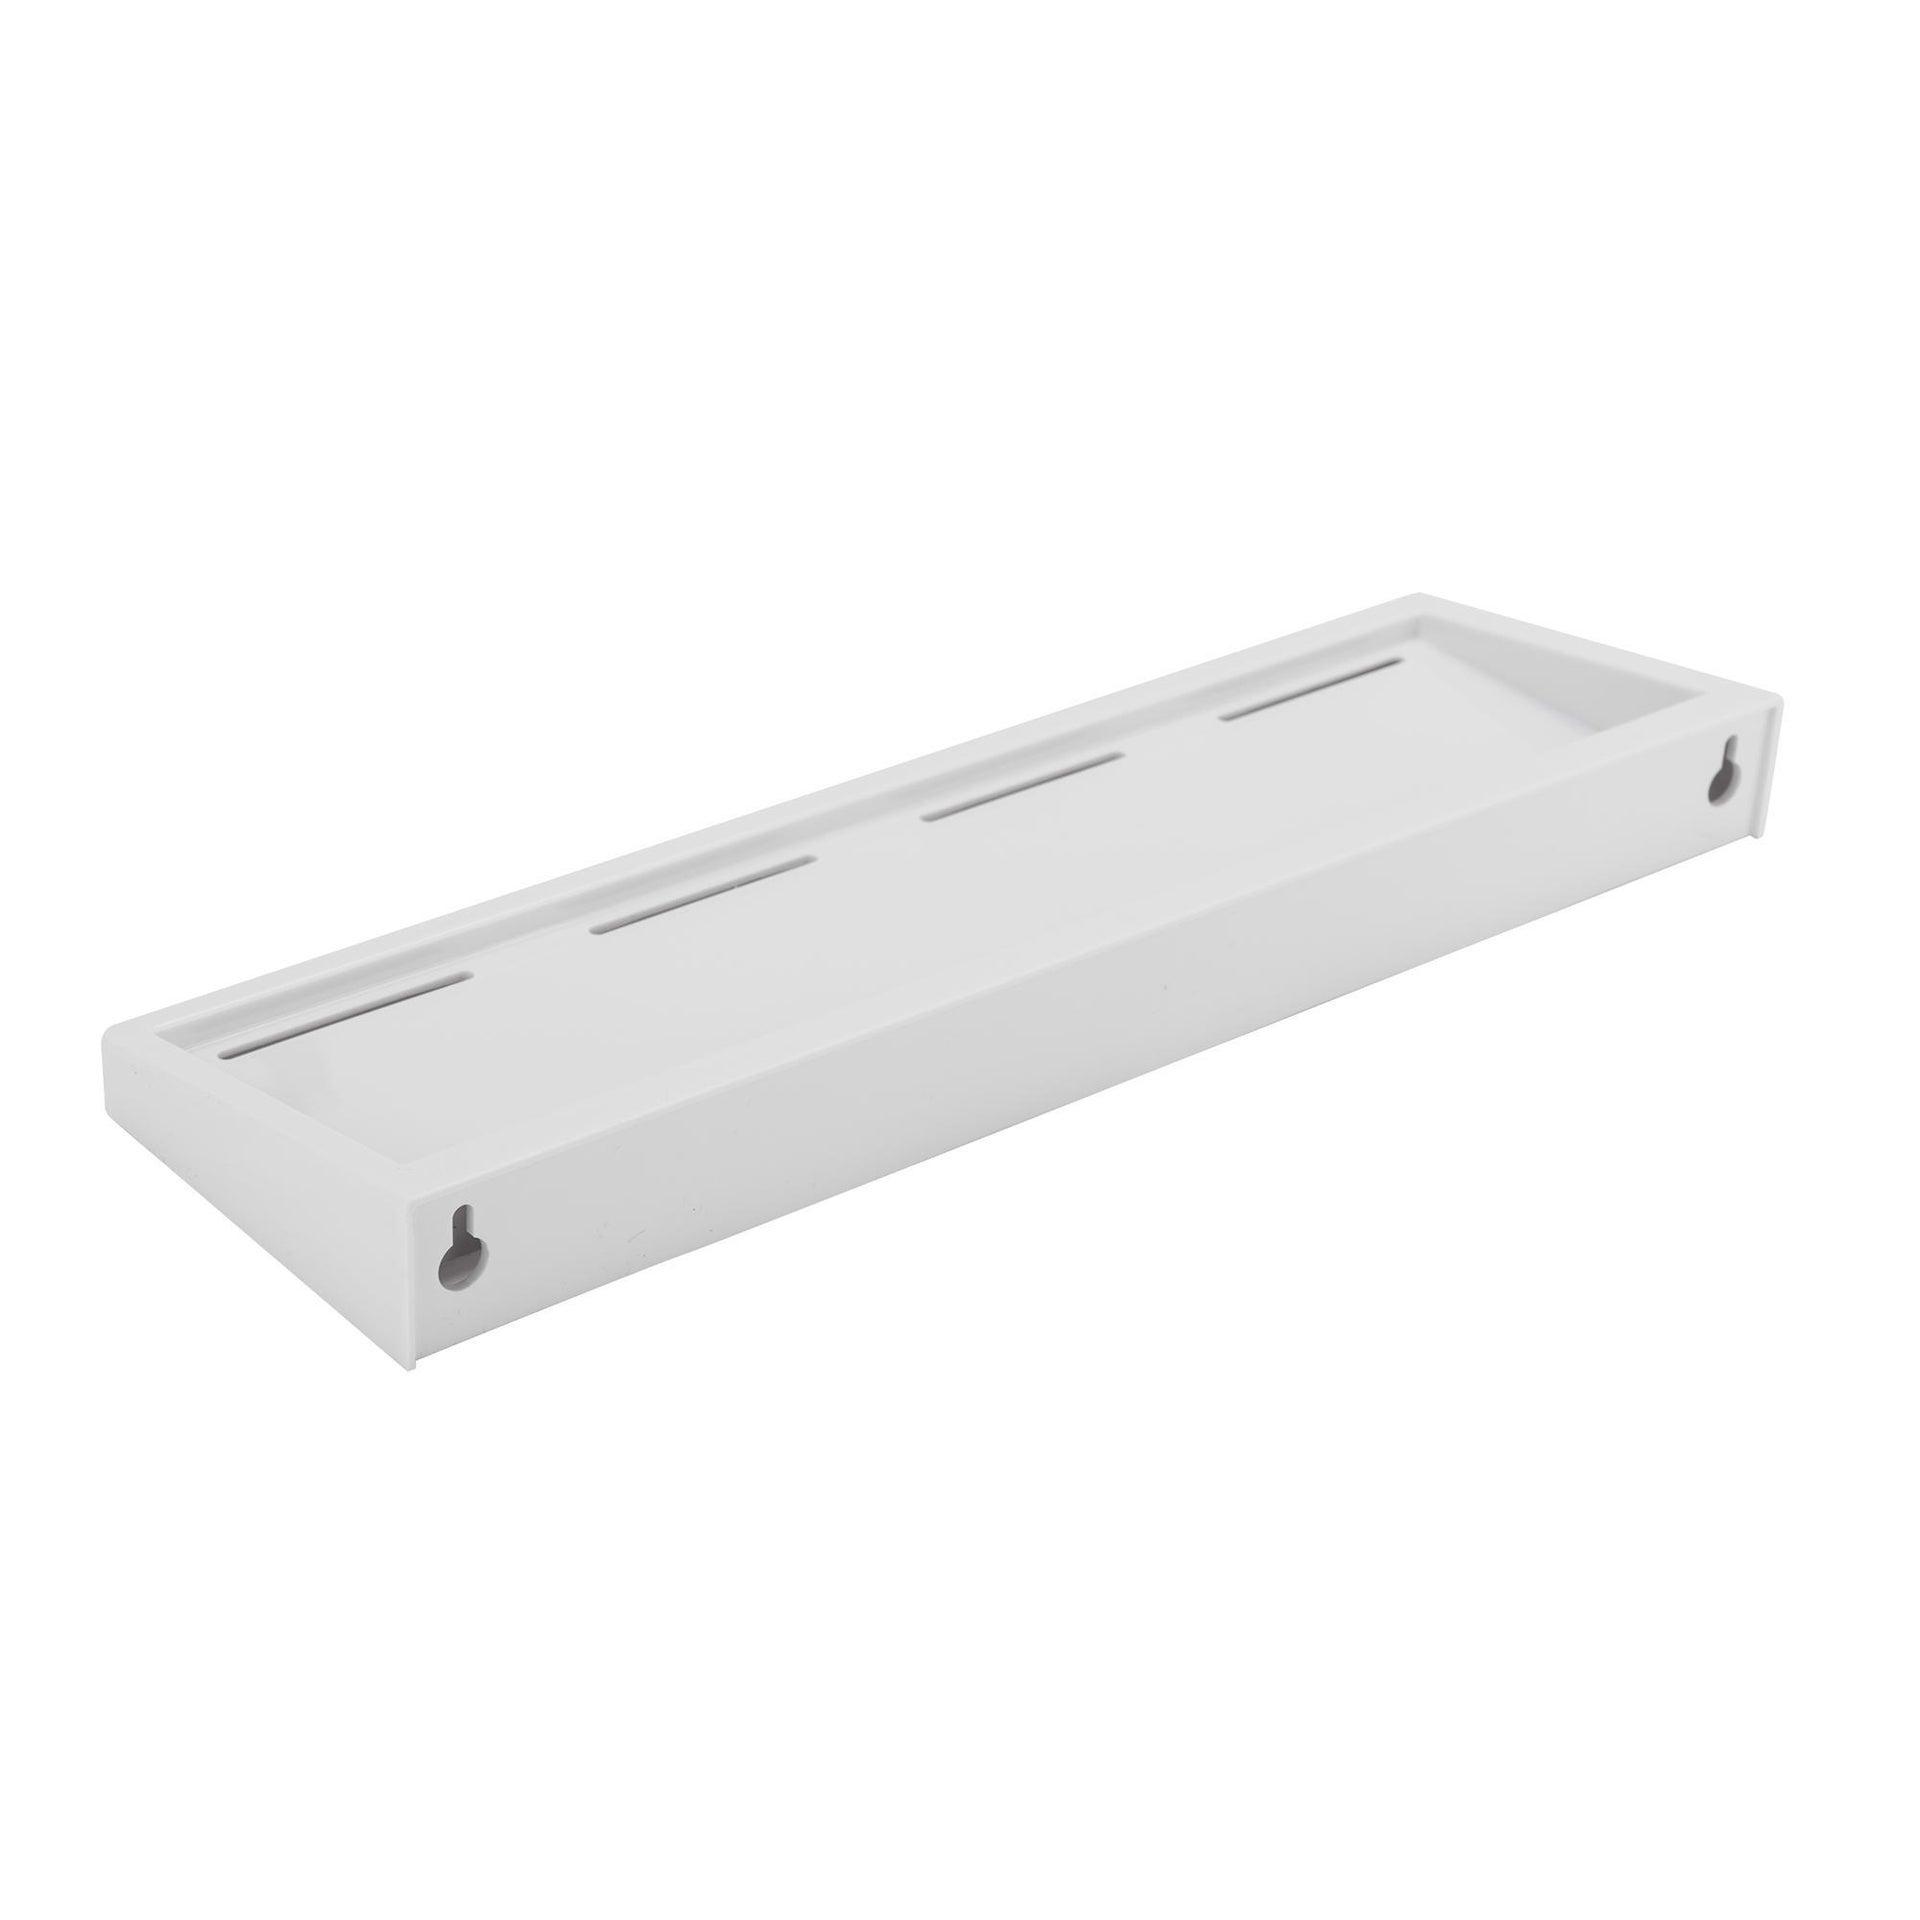 Mensola per bagno Funky L 40 cm bianco - 2